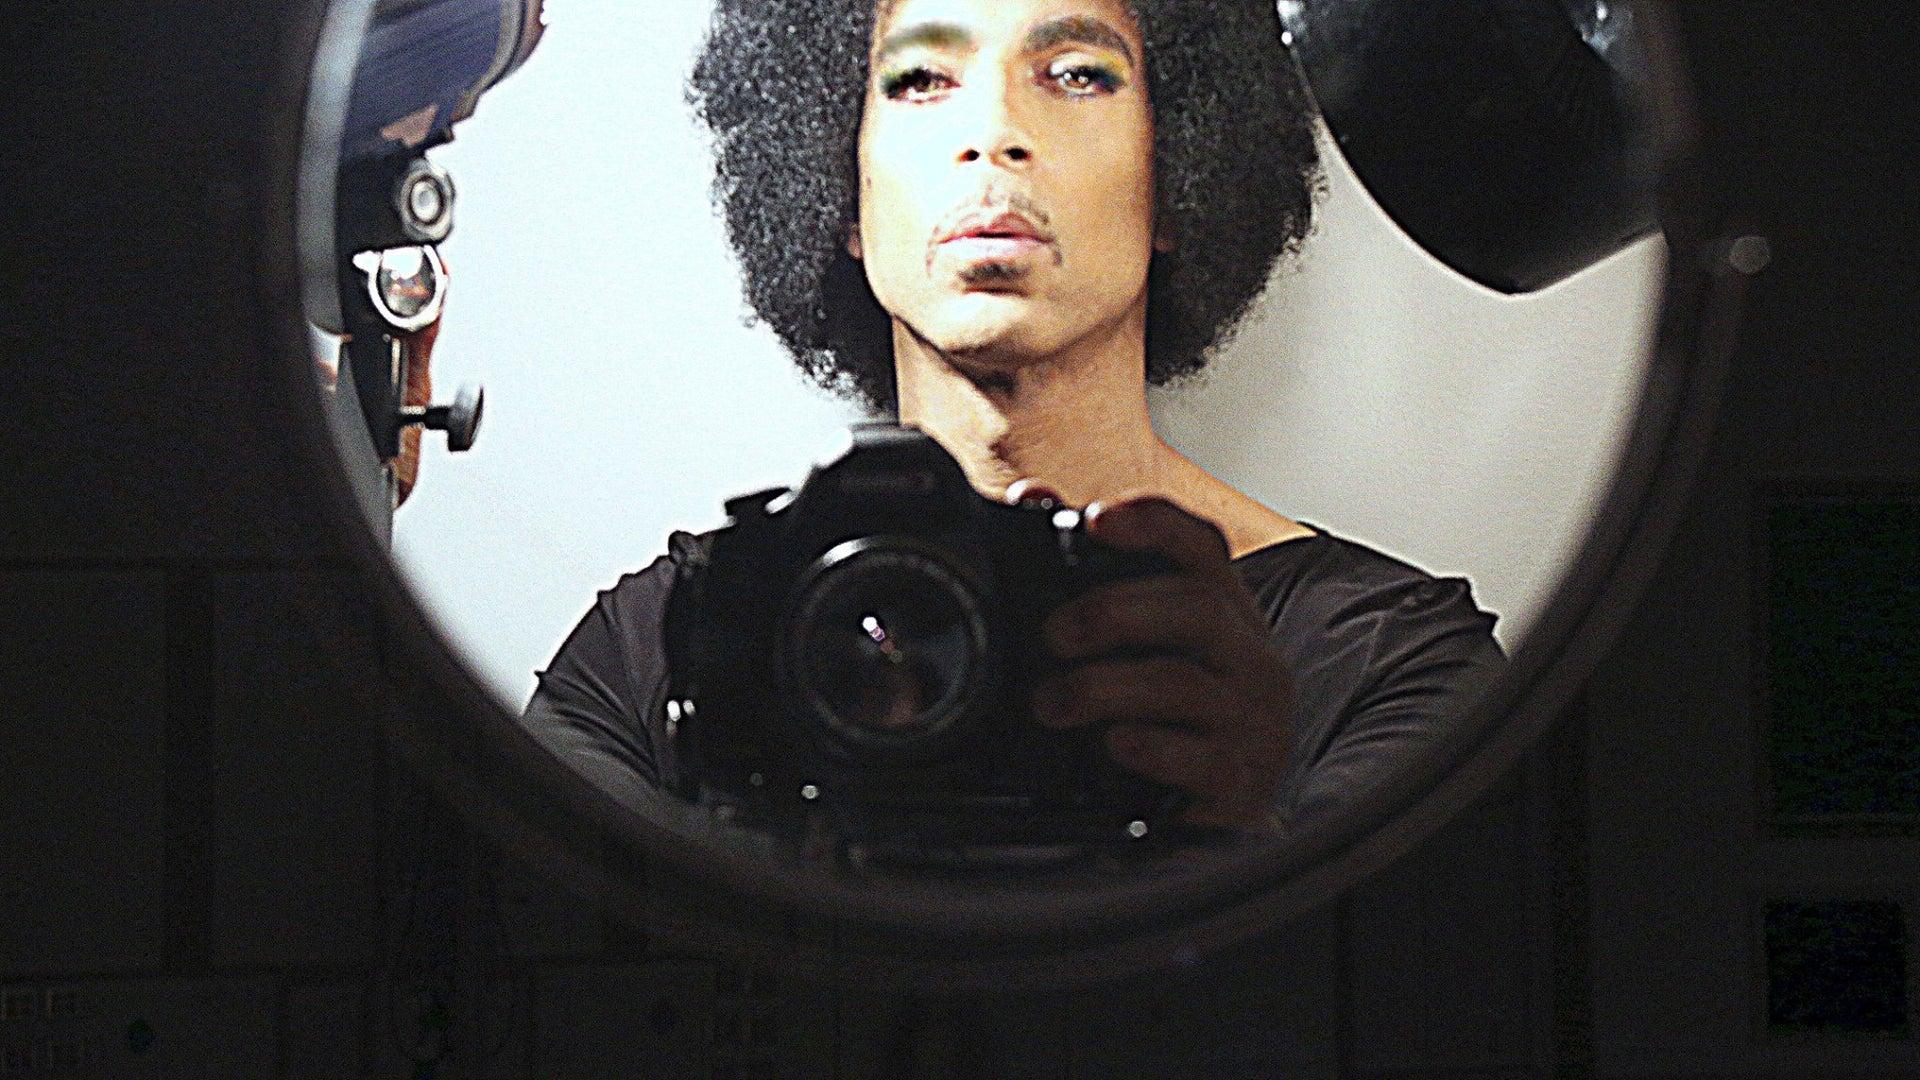 Prince Hits Delete, Delete on All His Social Media Accounts